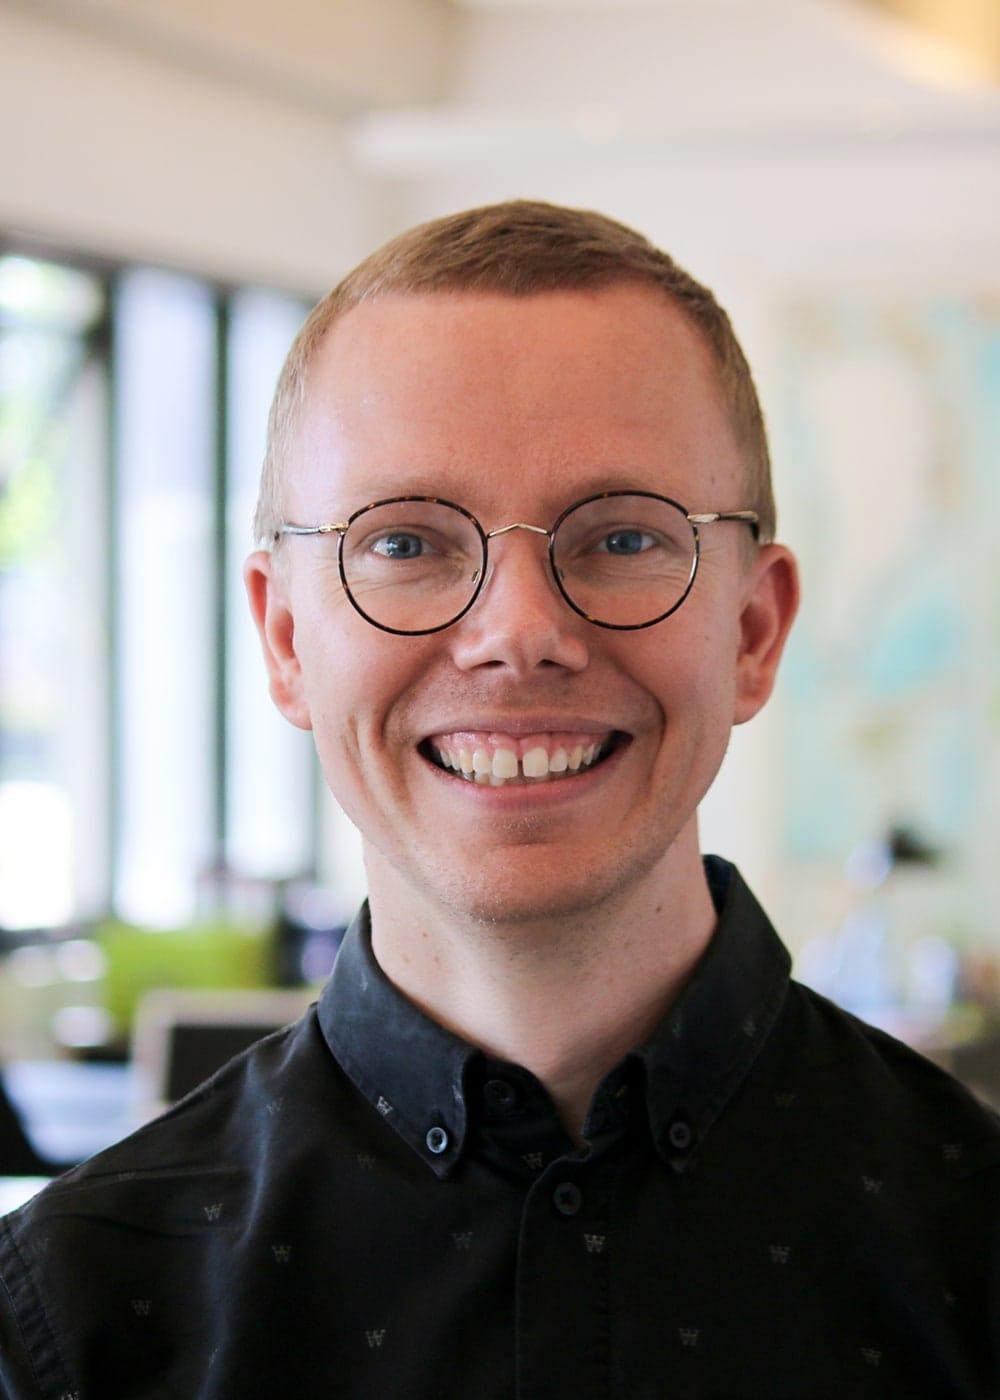 Rasmus Balder Holmgaard Larsen